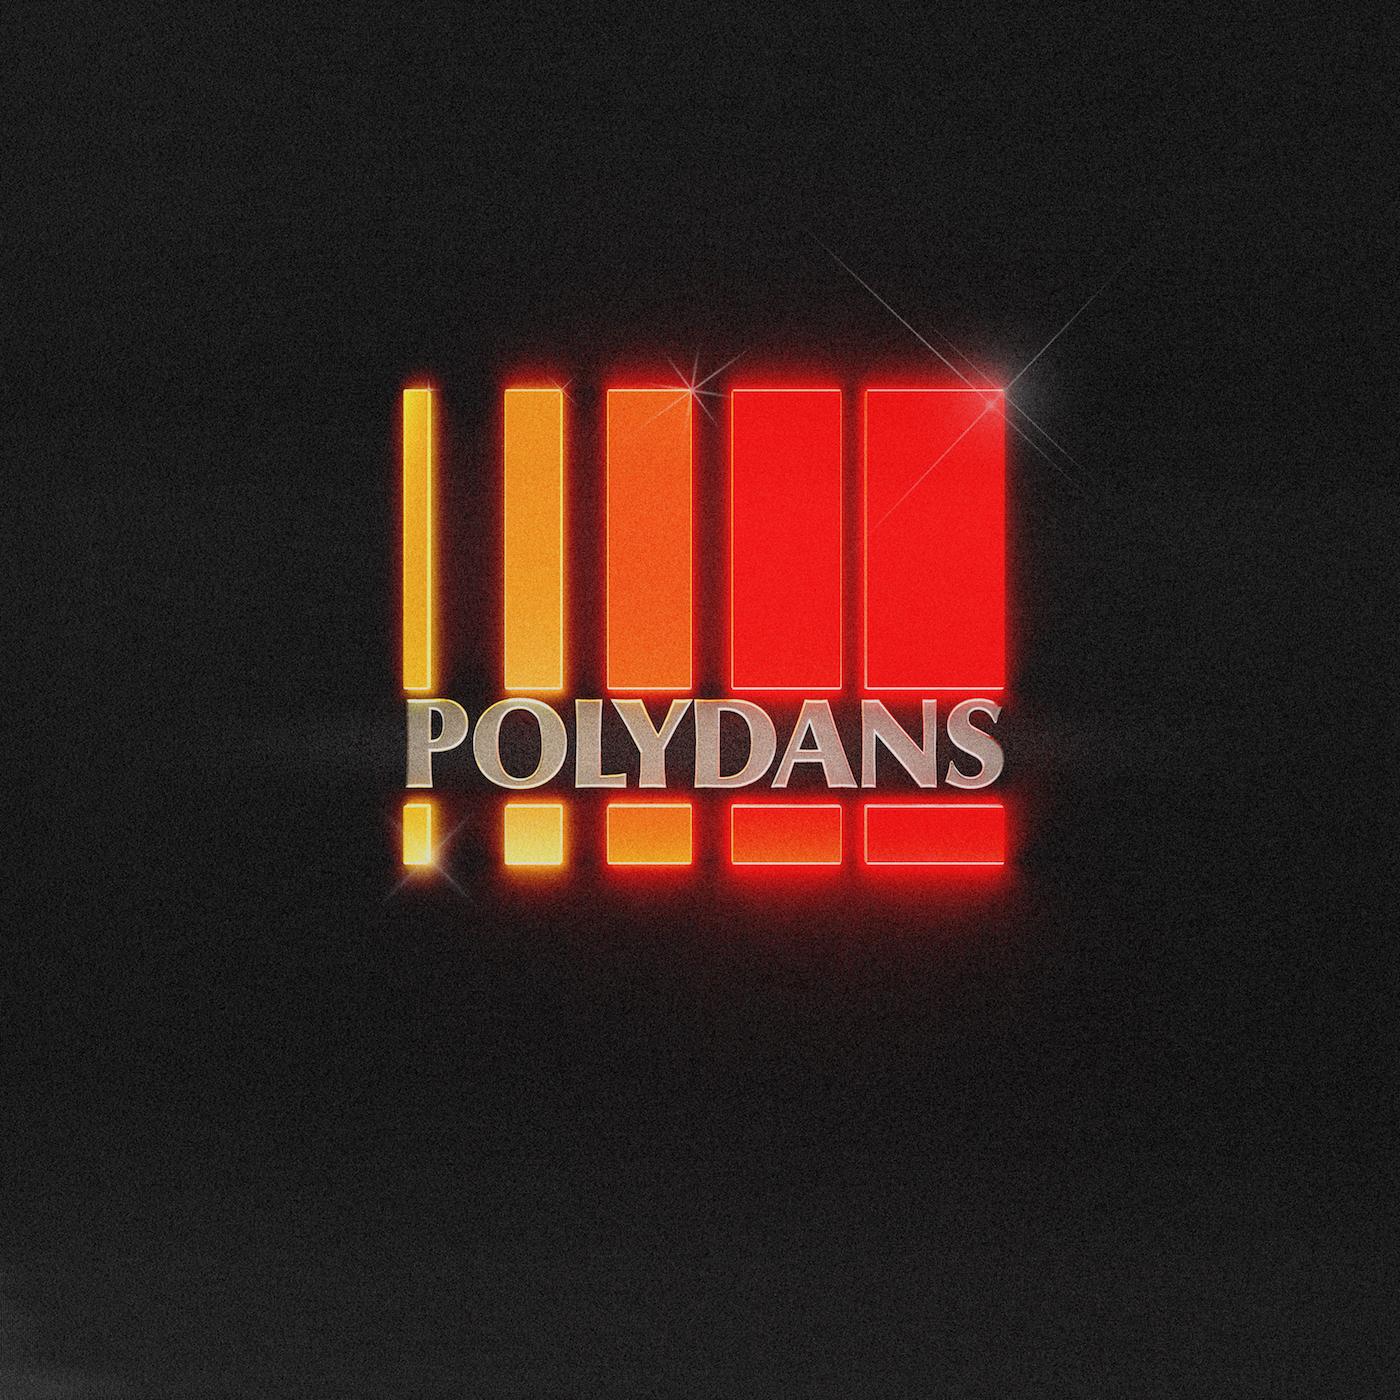 roosevelt_polydans_1.jpg